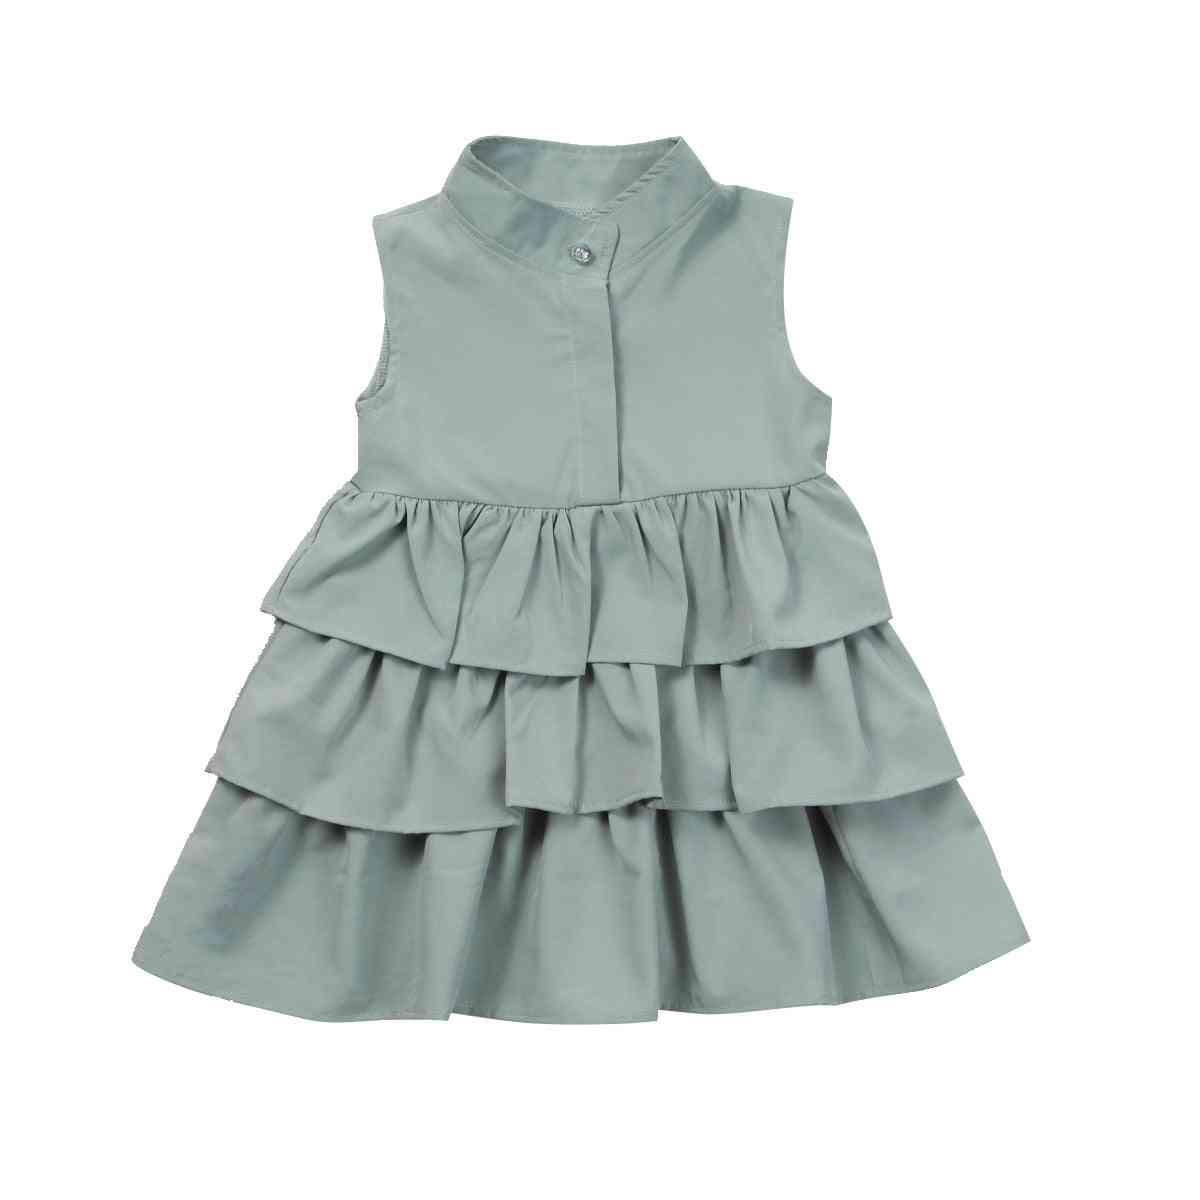 Summer Cute Ball Gown, Sleeveless, O Neck Dress For Kid Girl